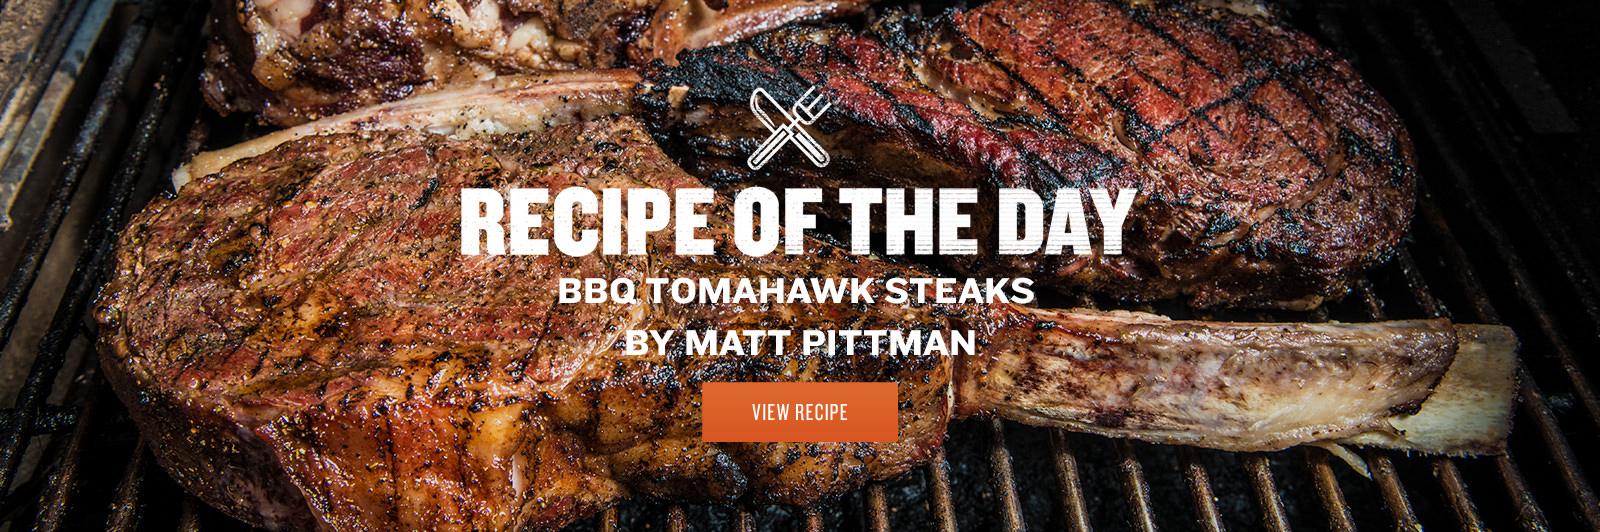 BBQ Tomahawk Steaks by Matt Pittman